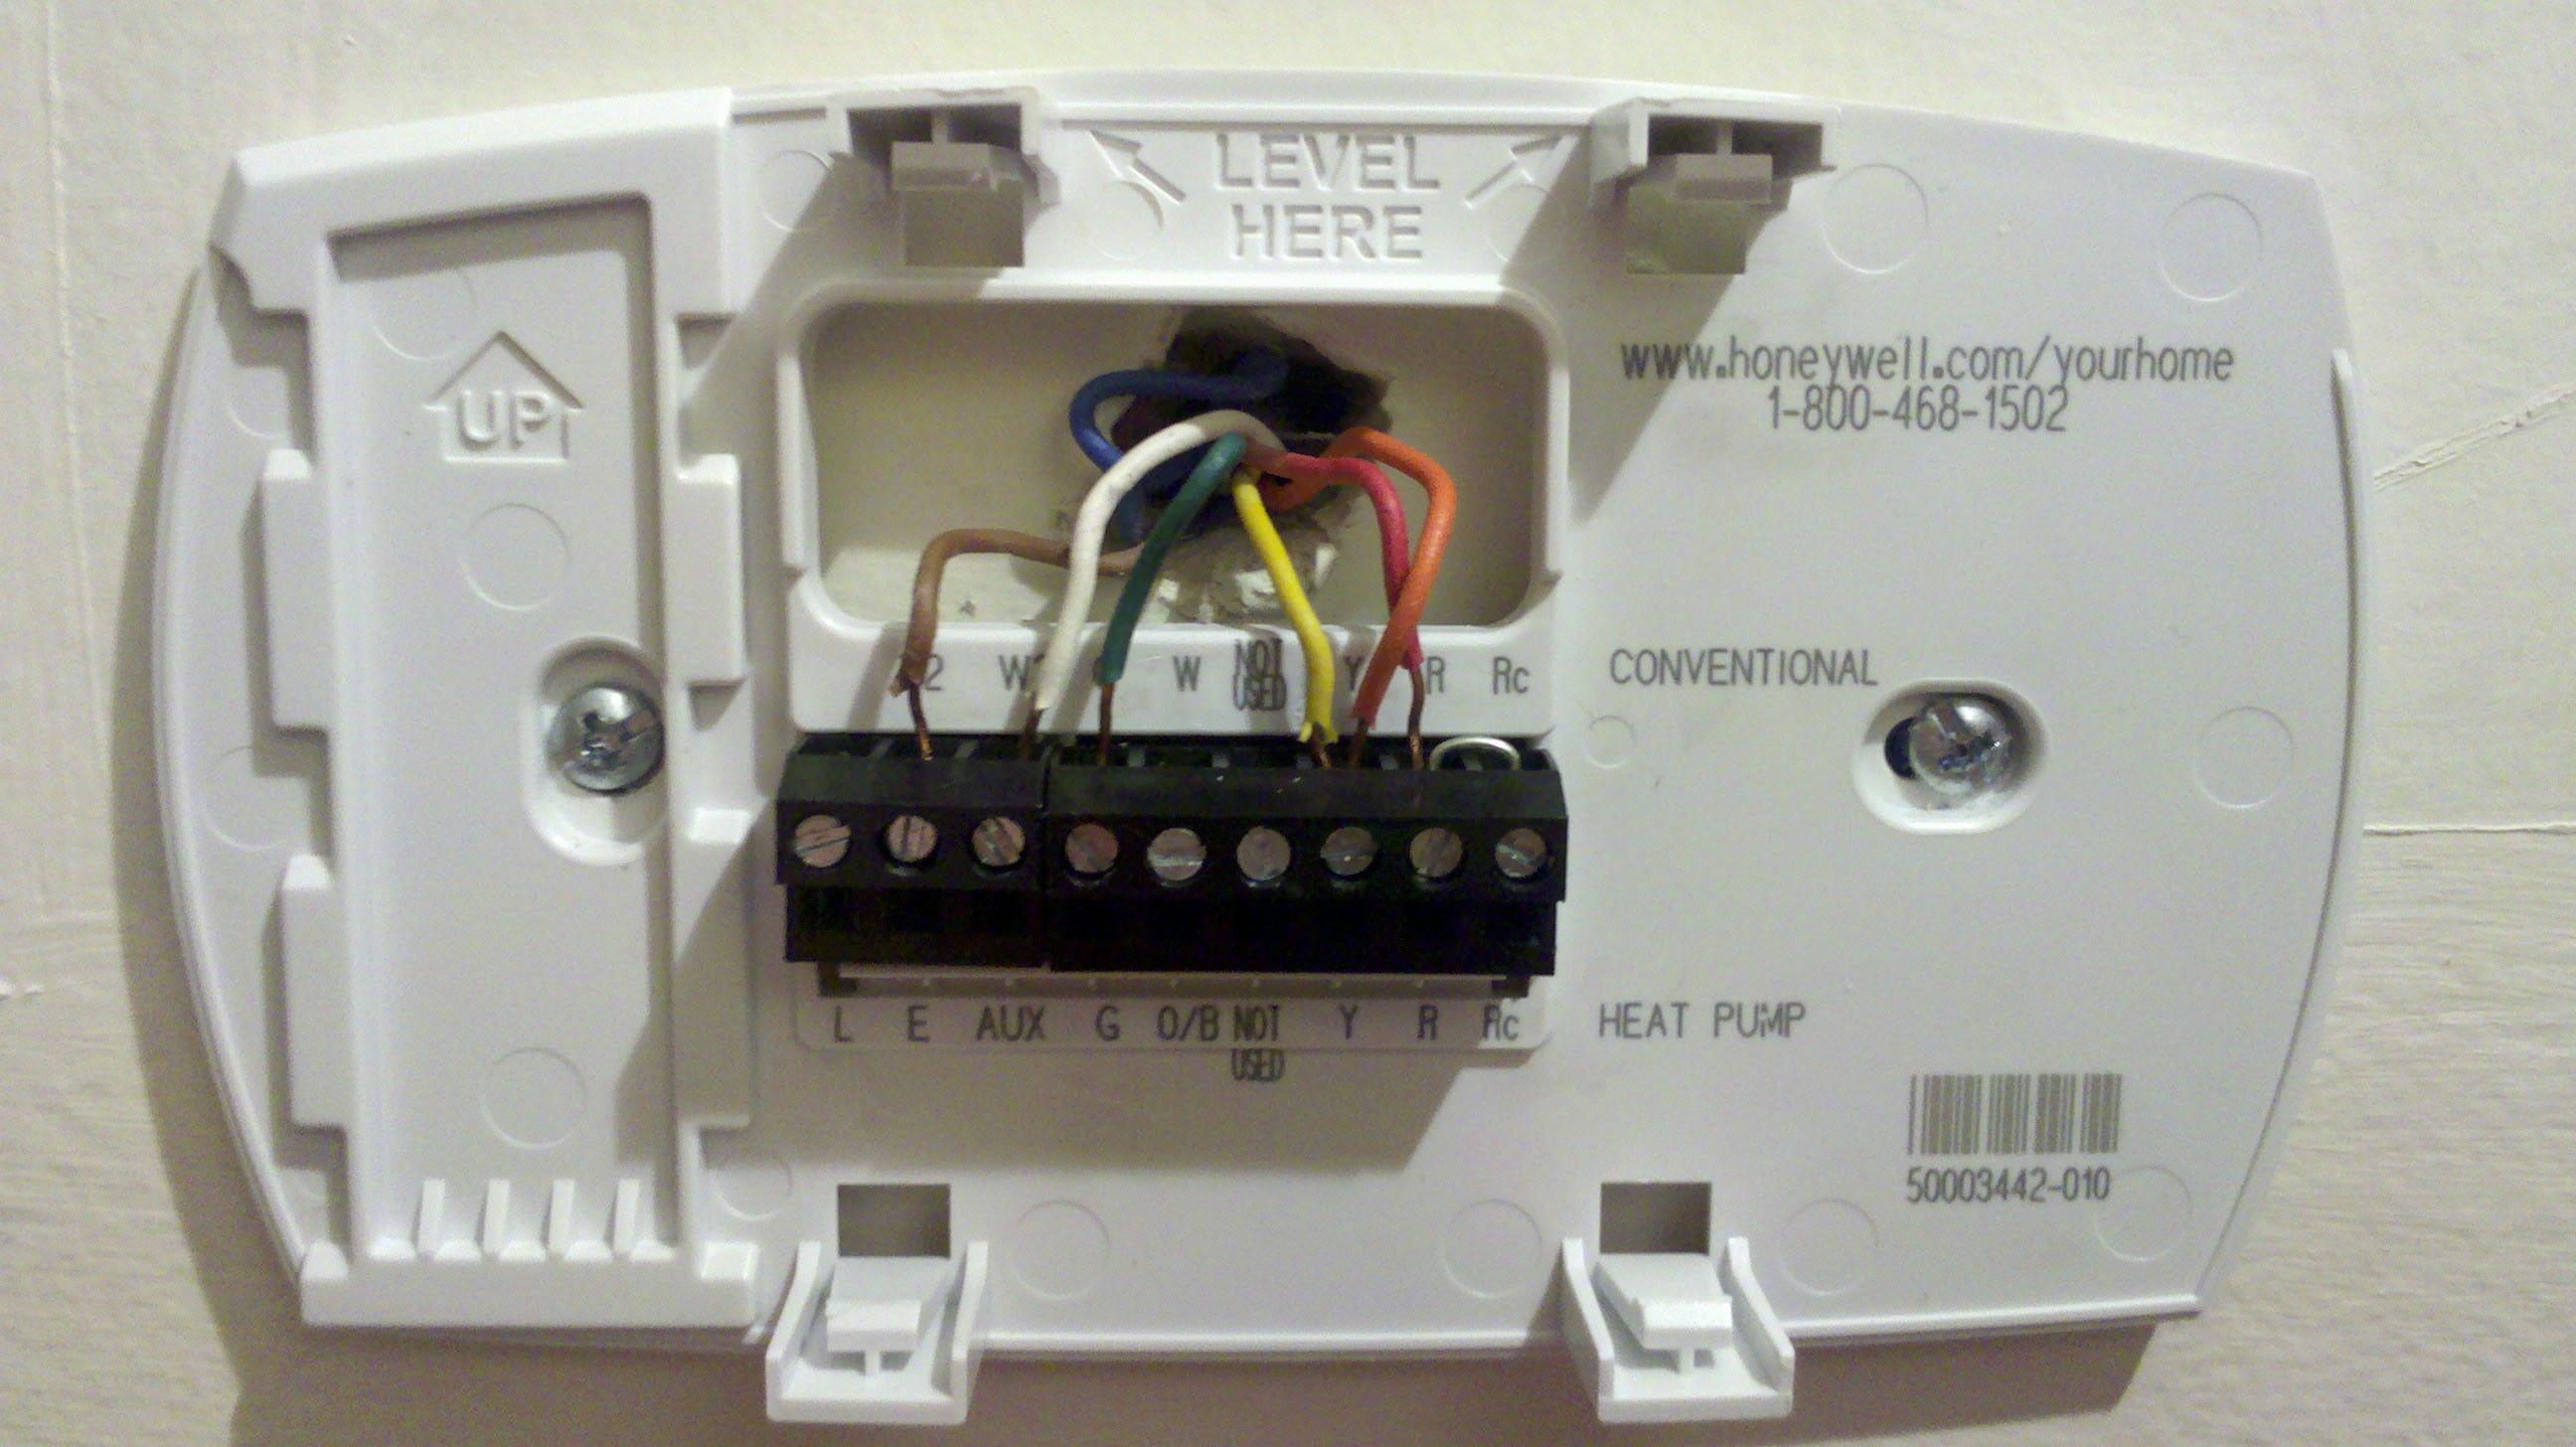 New Honeywell Central Heating thermostat Wiring Diagram #diagram  #diagramtemplate #diagra… | Thermostat wiring, Thermostat installation,  Baseboard heater thermostatPinterest